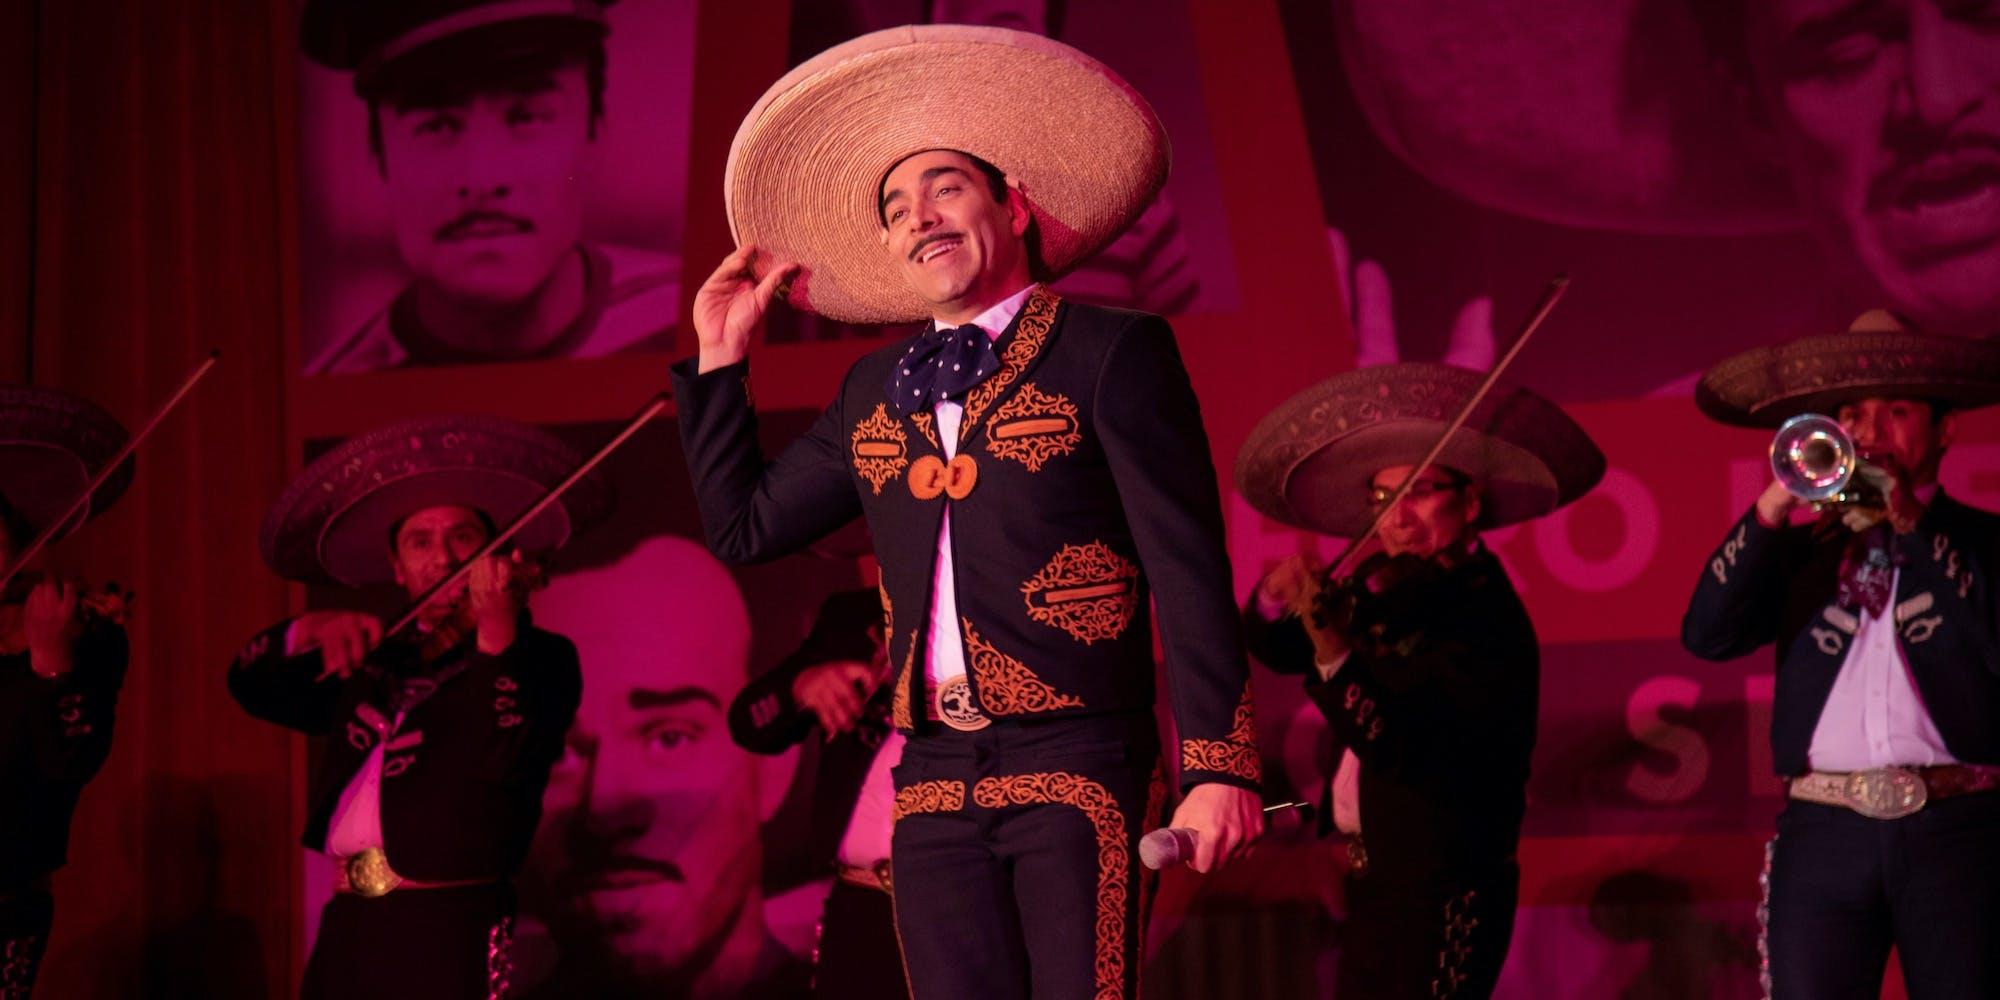 Still from the musical Como Caído del Cielo on Netflix.